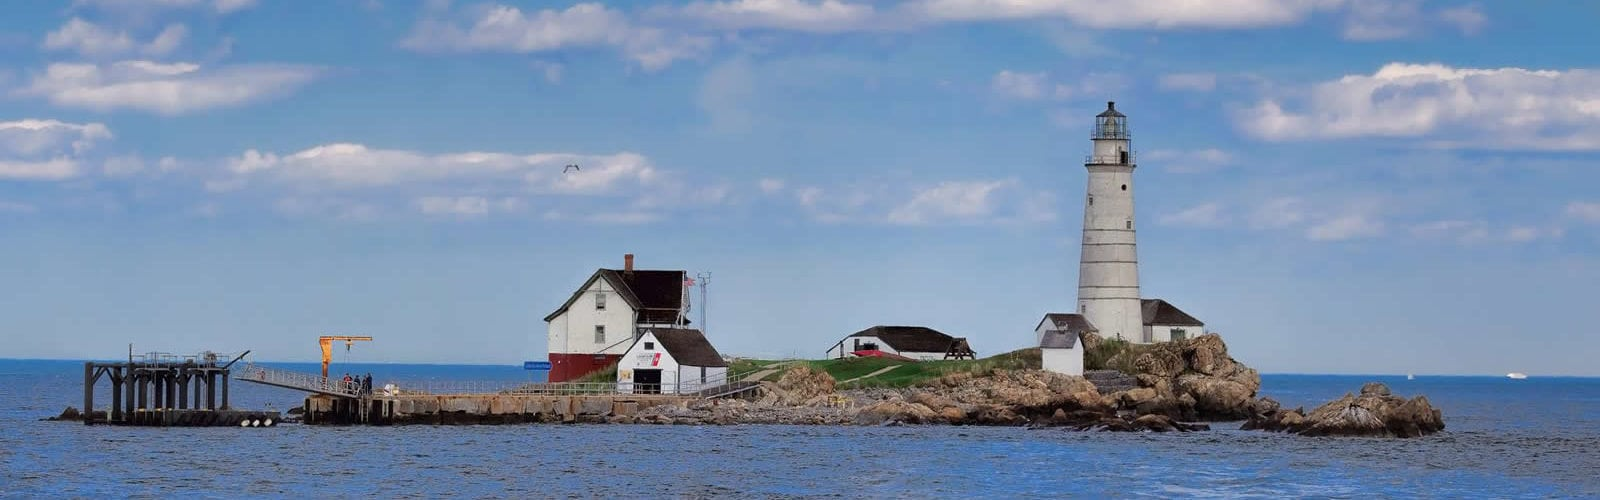 boston-harbor-islands-decouvrir-activites-iles-une-2